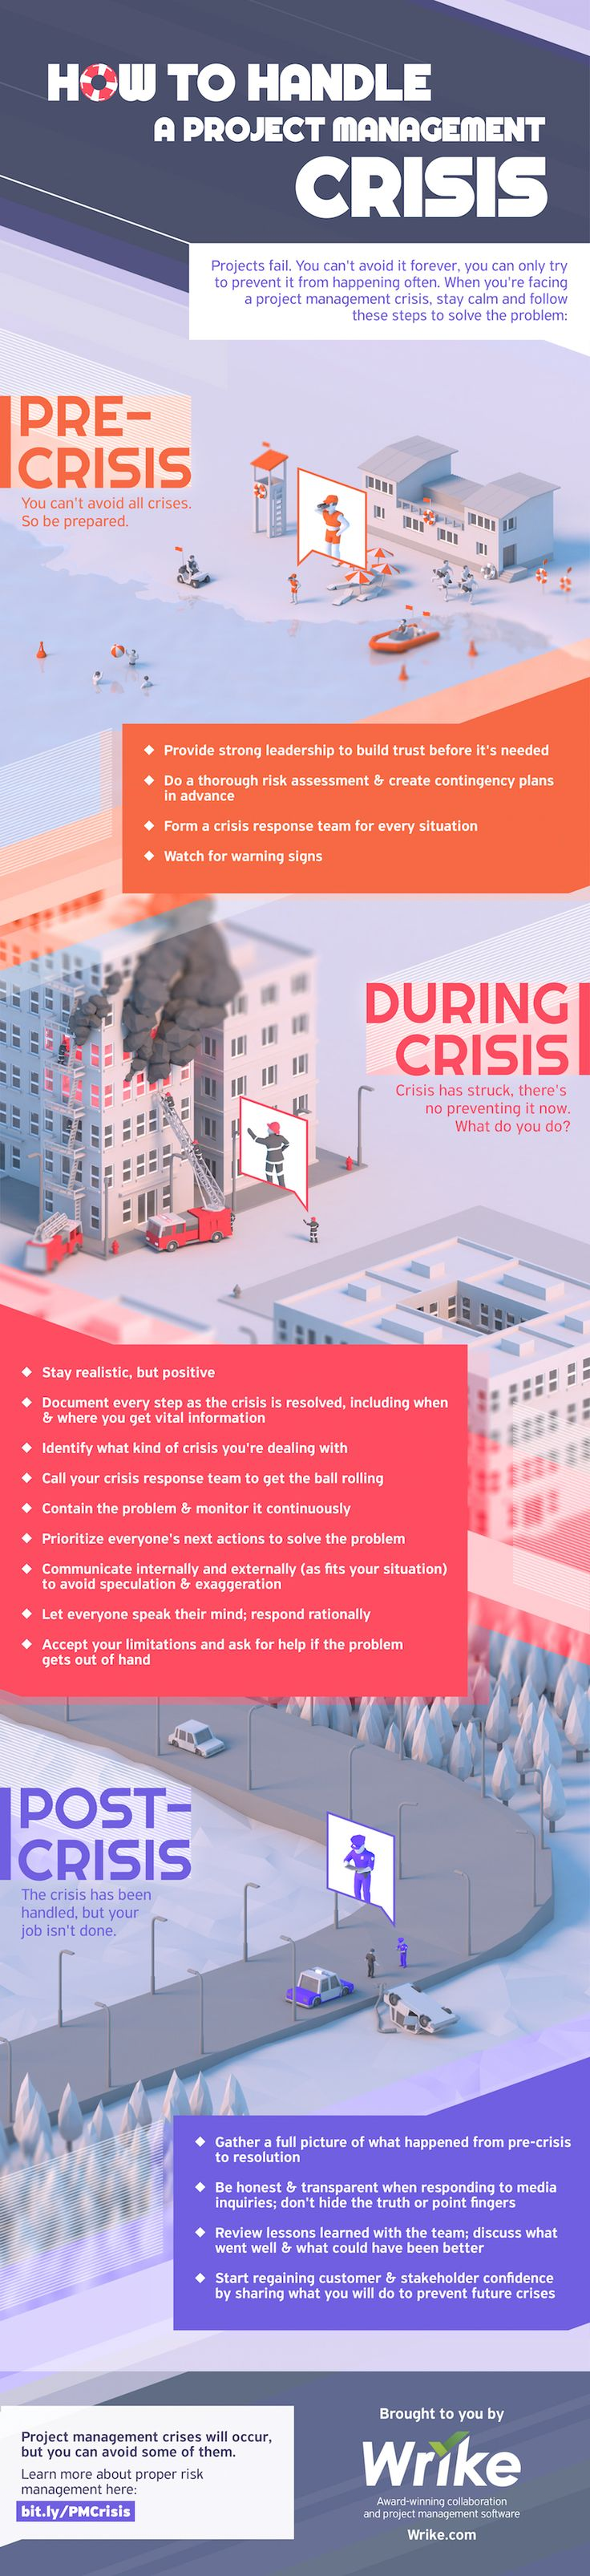 How to Handle a Project Management Crisis (Infographic) —via Wrike: https://www.wrike.com/blog/project-management-crisis-infographic/?utm_source=pinterest&utm_medium=socials&utm_campaign=blogposts